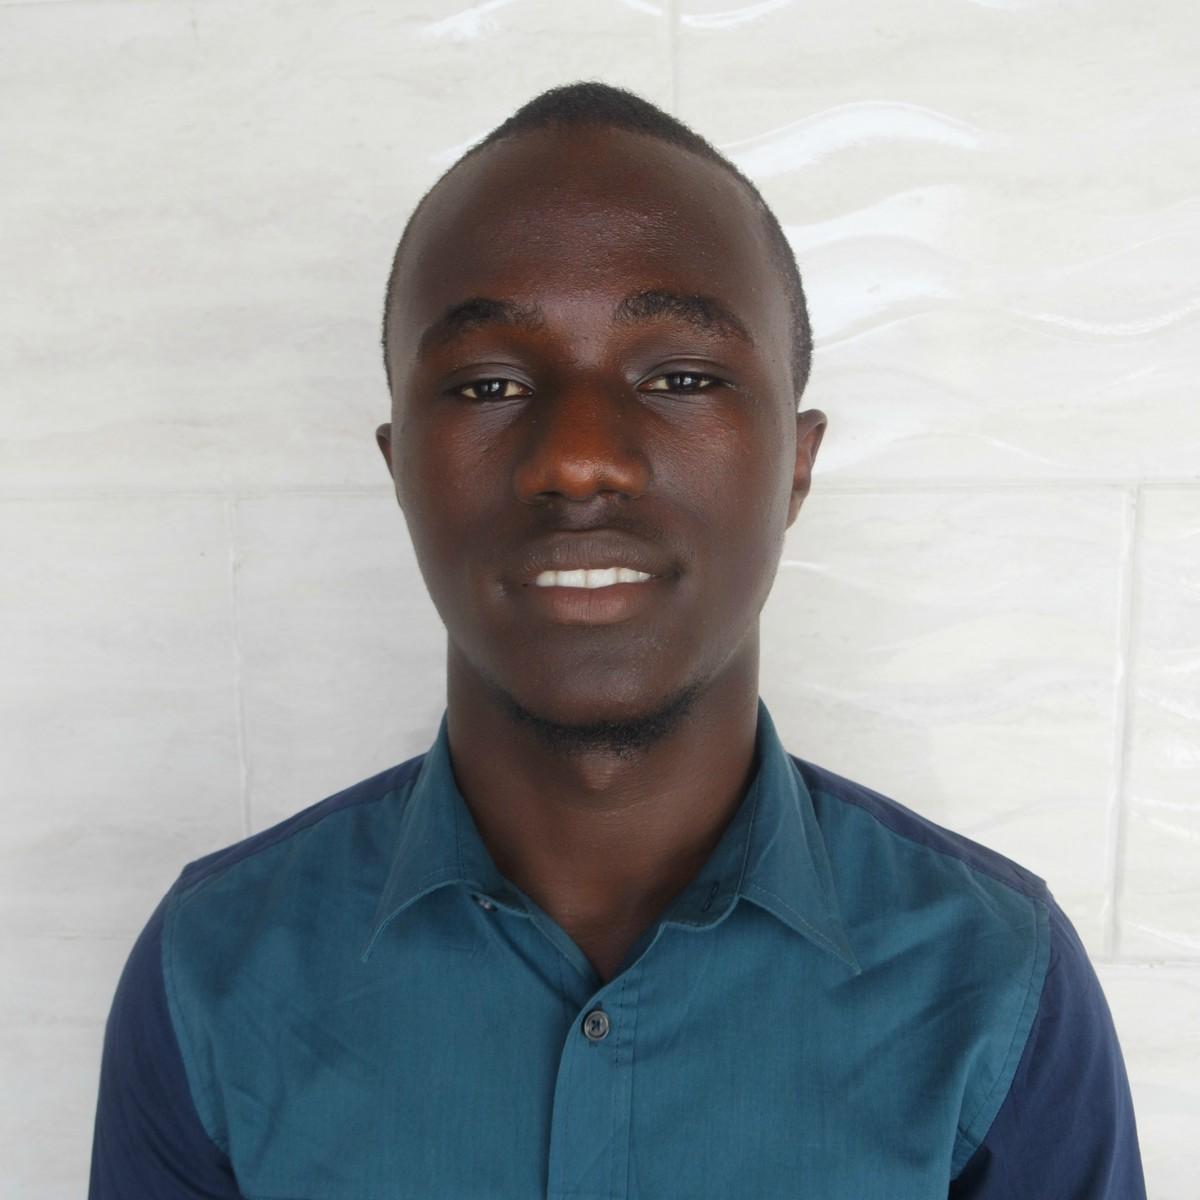 joseph-blackie-williette-safehouse-monrovia-liberia